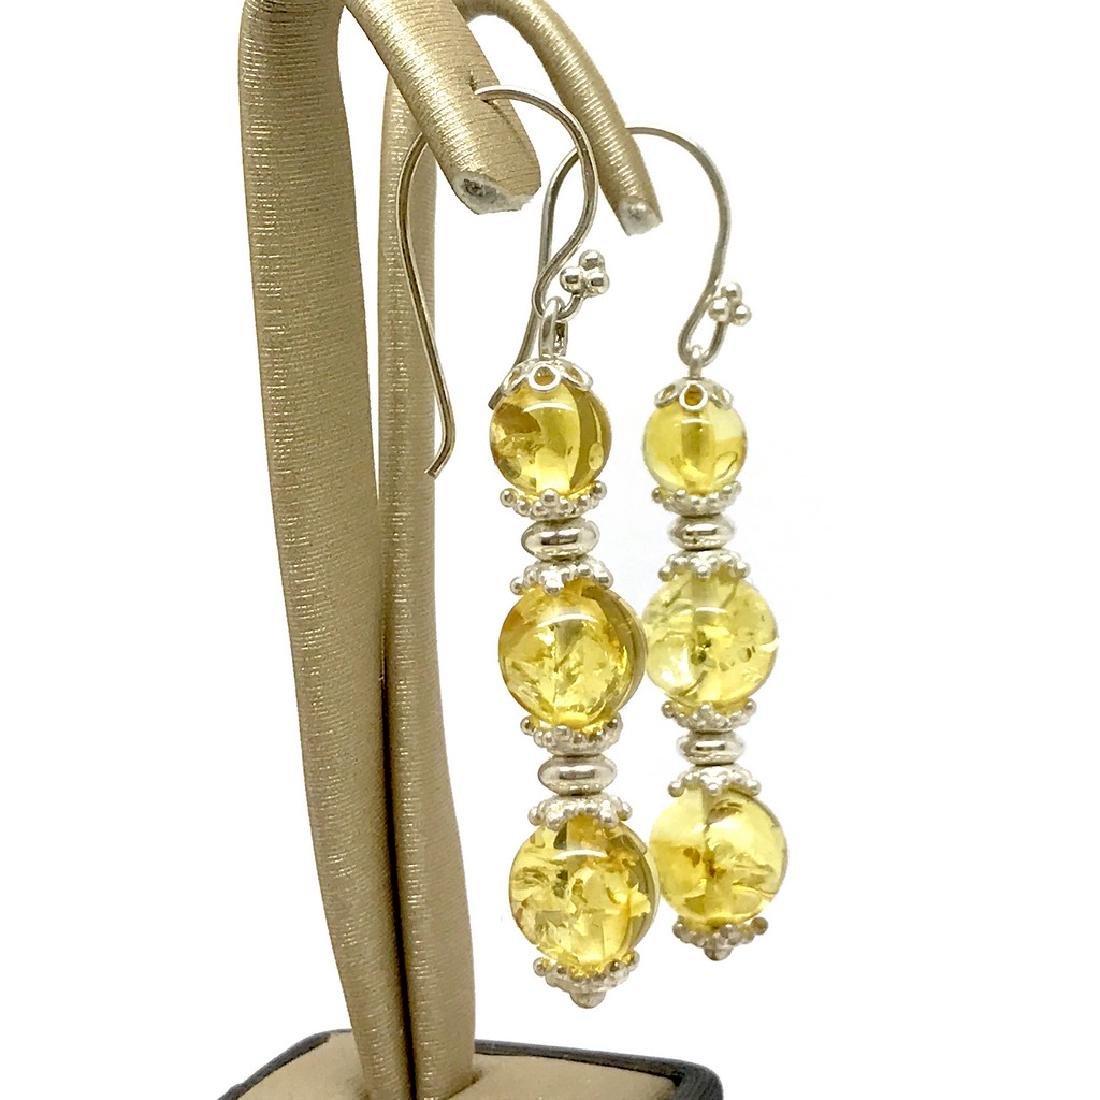 Baltic amber & sterling silver bracelet & earrings 19 - 7